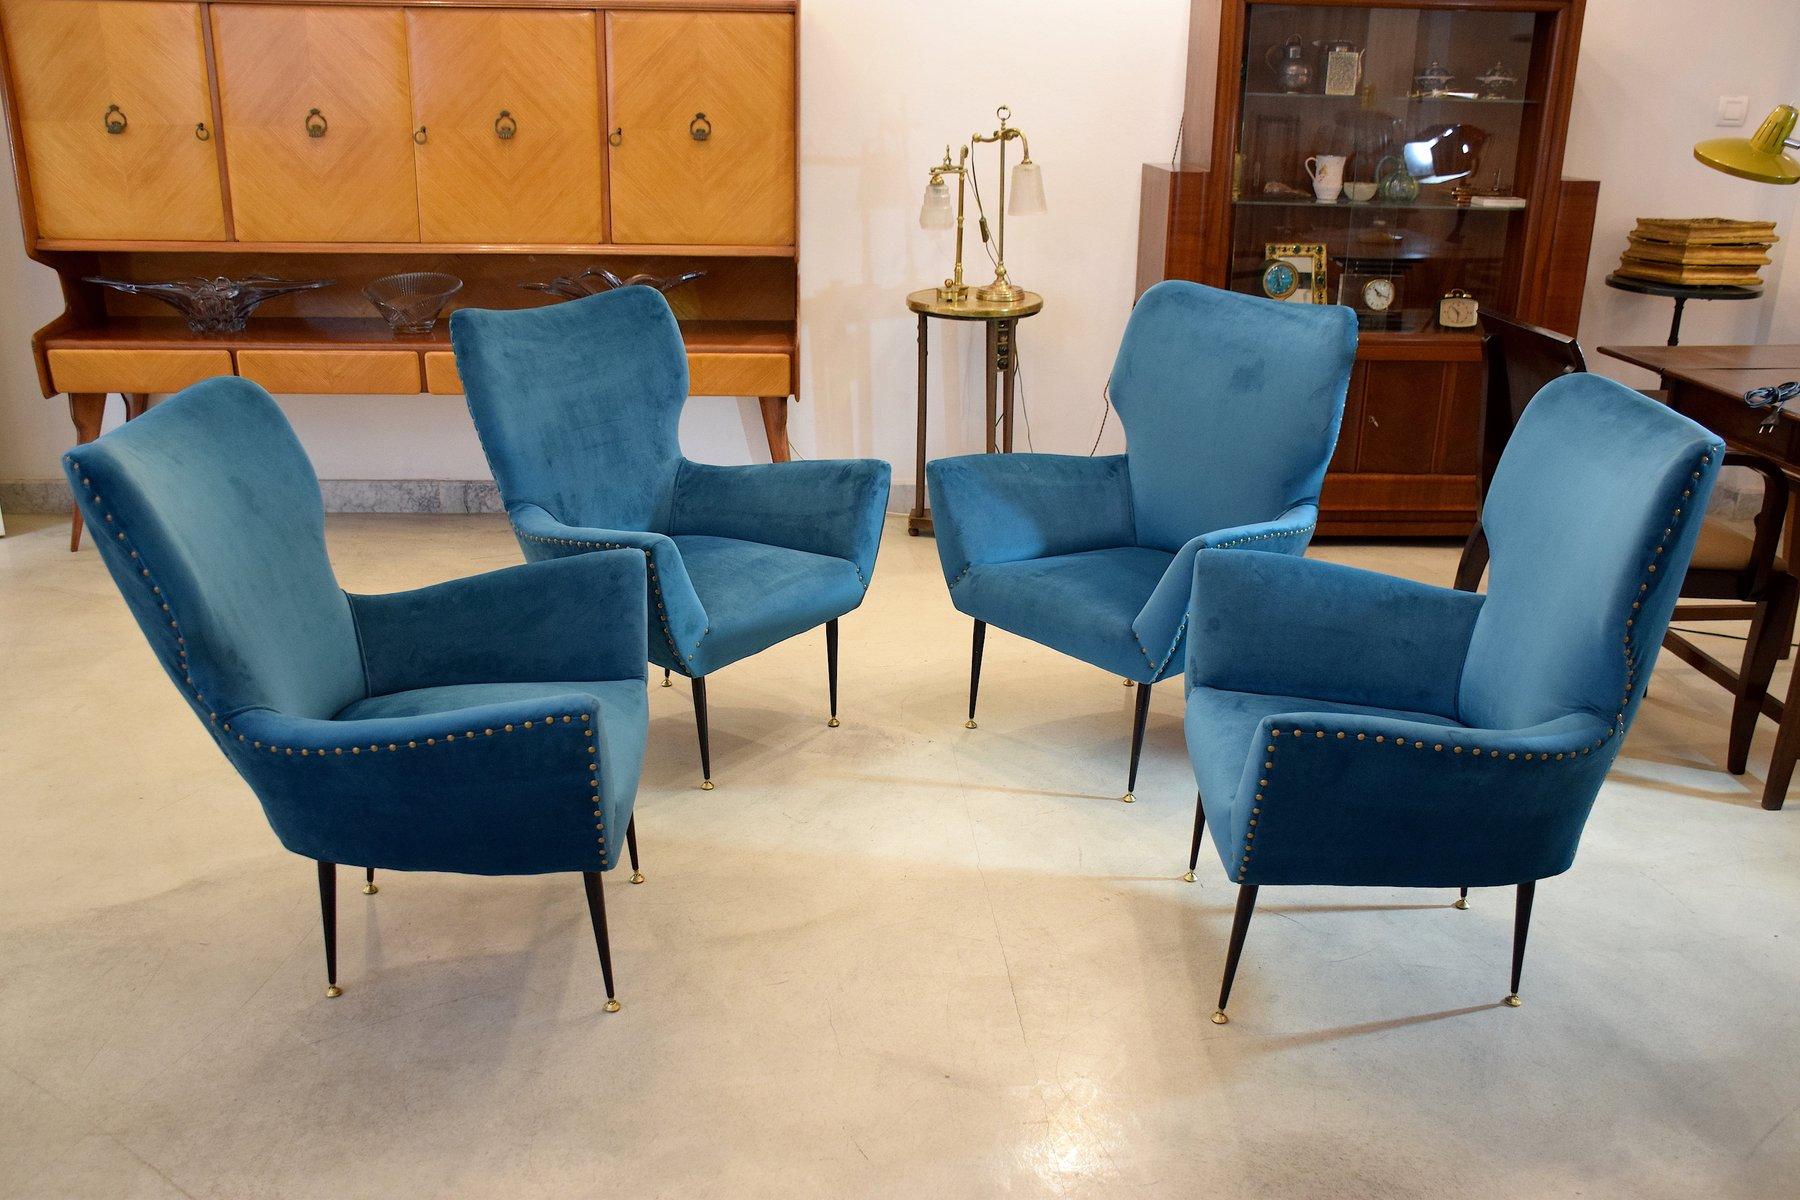 Geschwungene italienische sessel 1950er 2er set bei for Italienische sessel